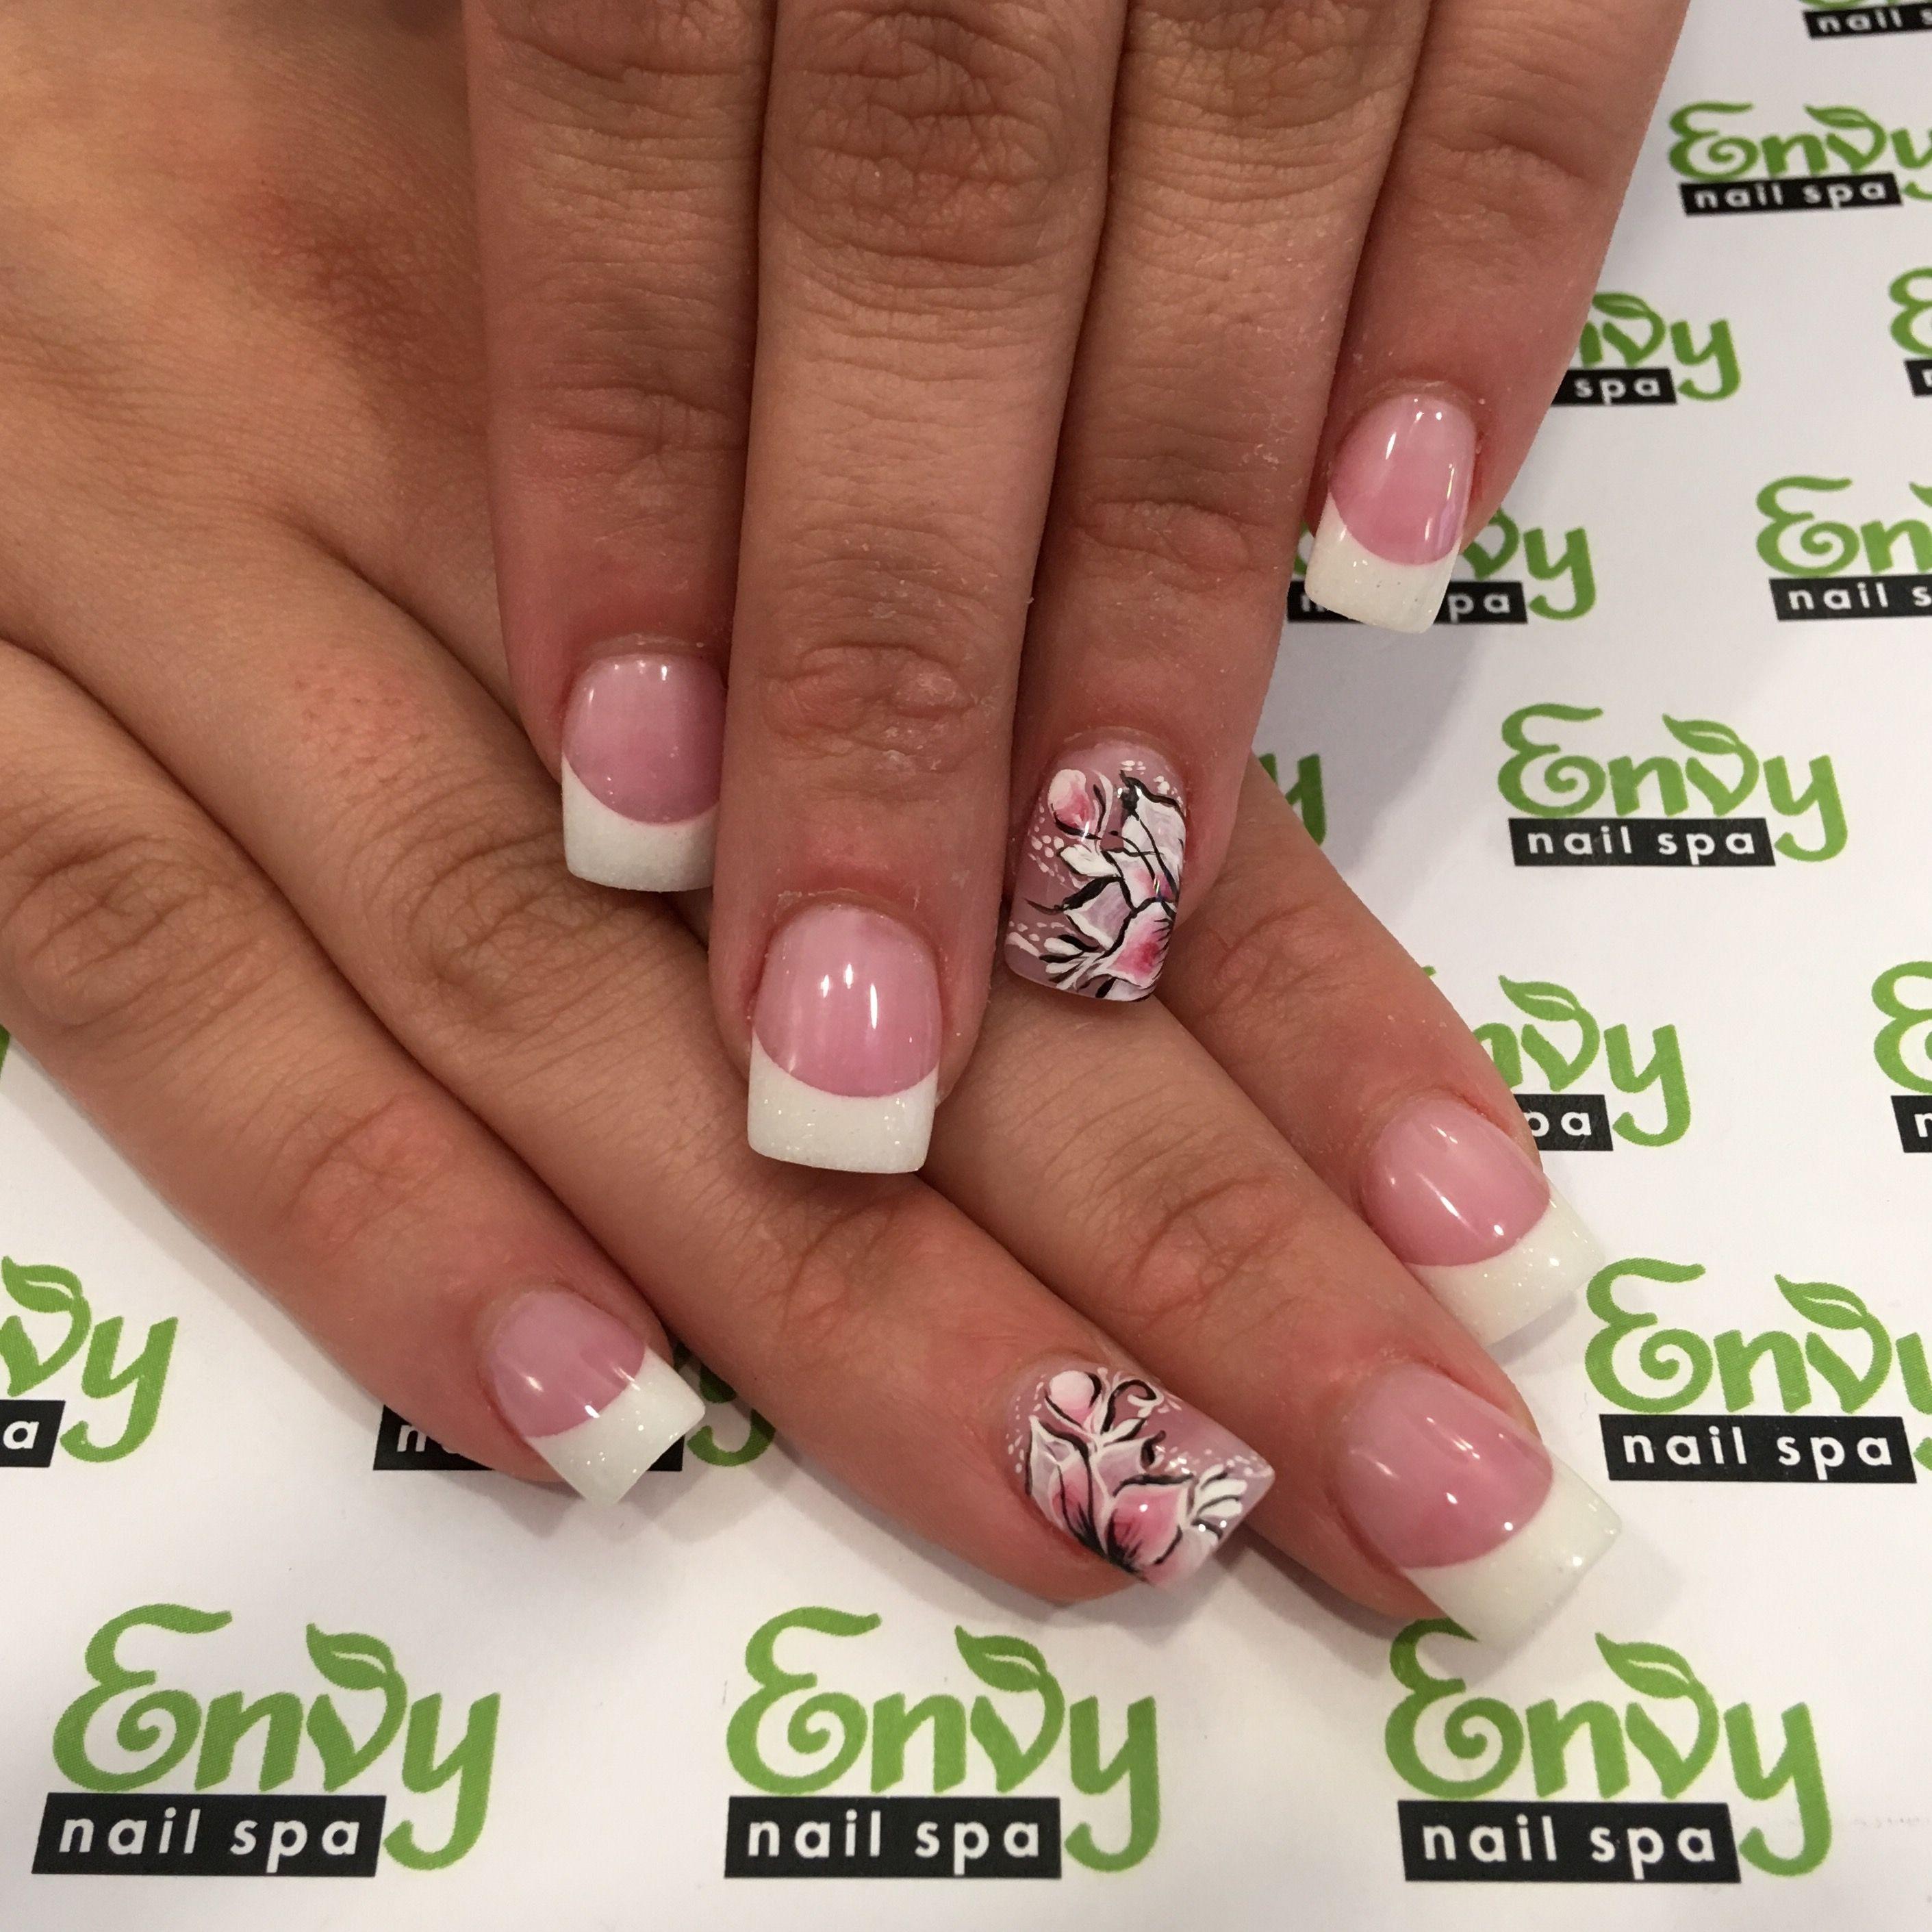 Tropical Flower Pink White Nails Envy Nail Spa Butterfly Nail Designs Pink White Nails Nail Designs